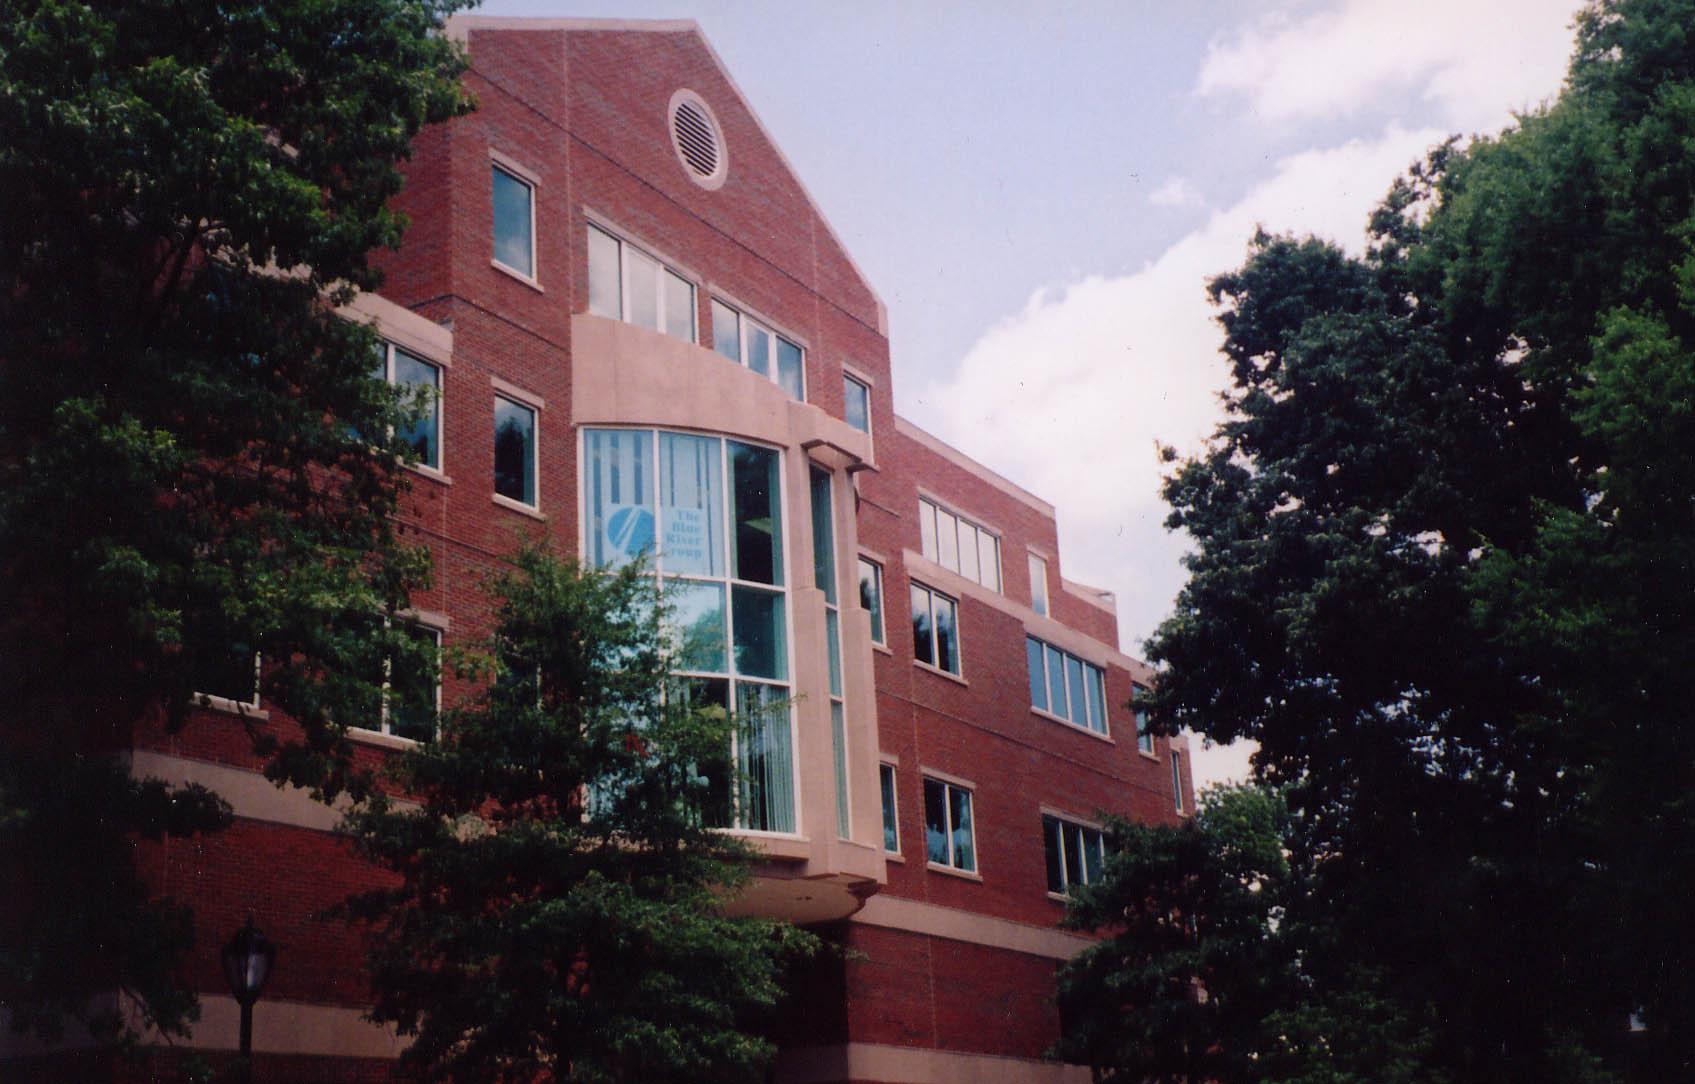 Exterior Cosby Center 02